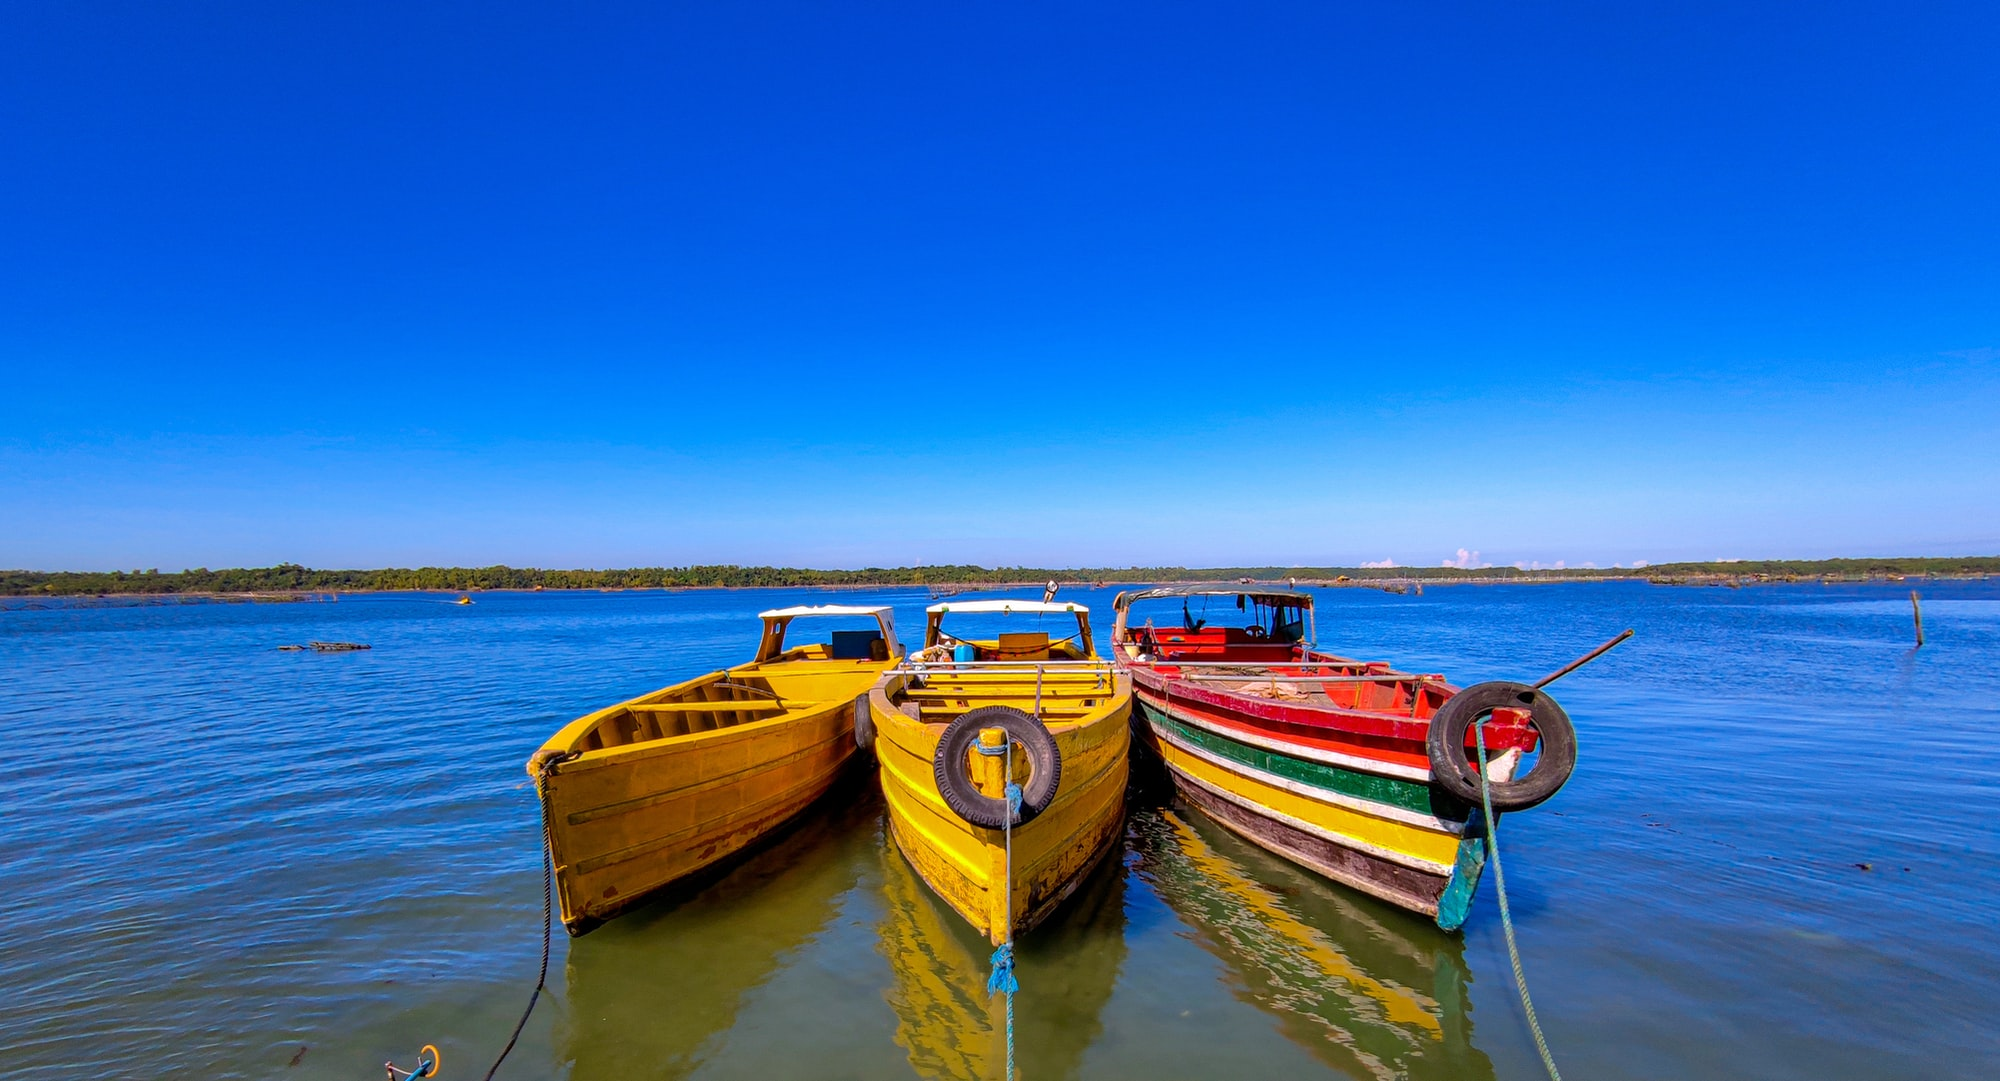 some boats in Siapar, Anda Pangasinan.